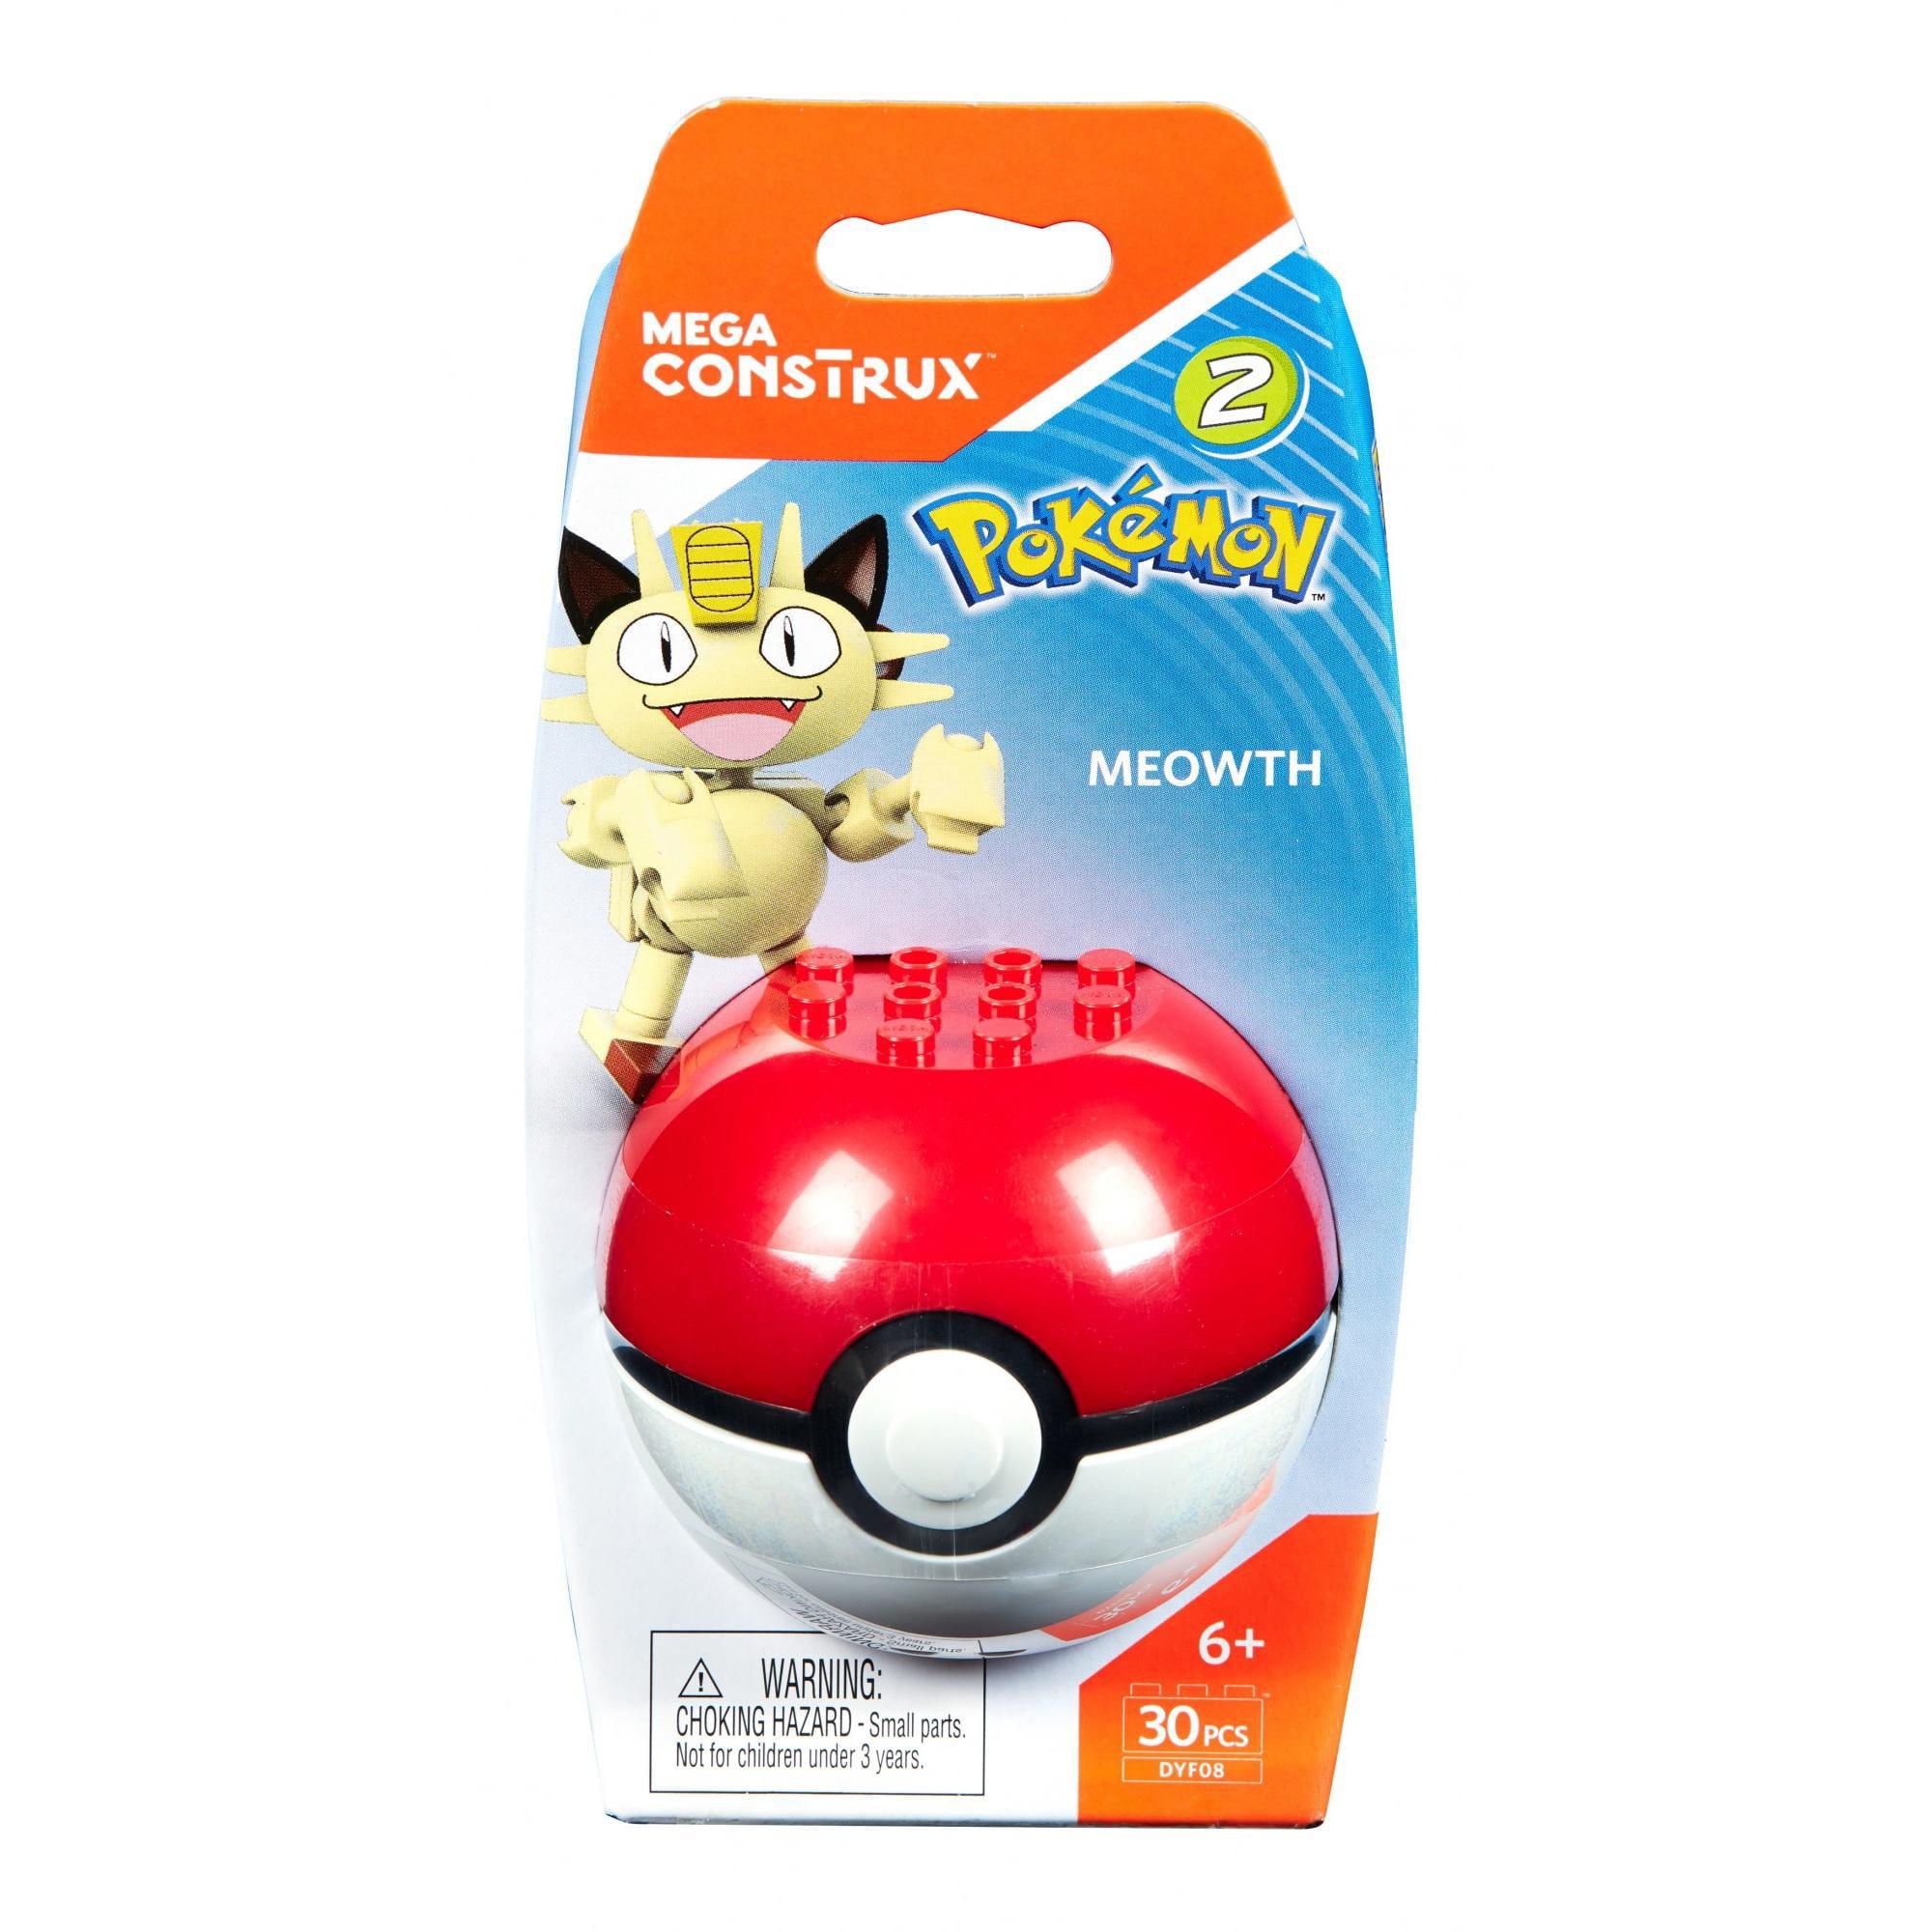 Mega Construx Pokemon Meowth Buildable Figure